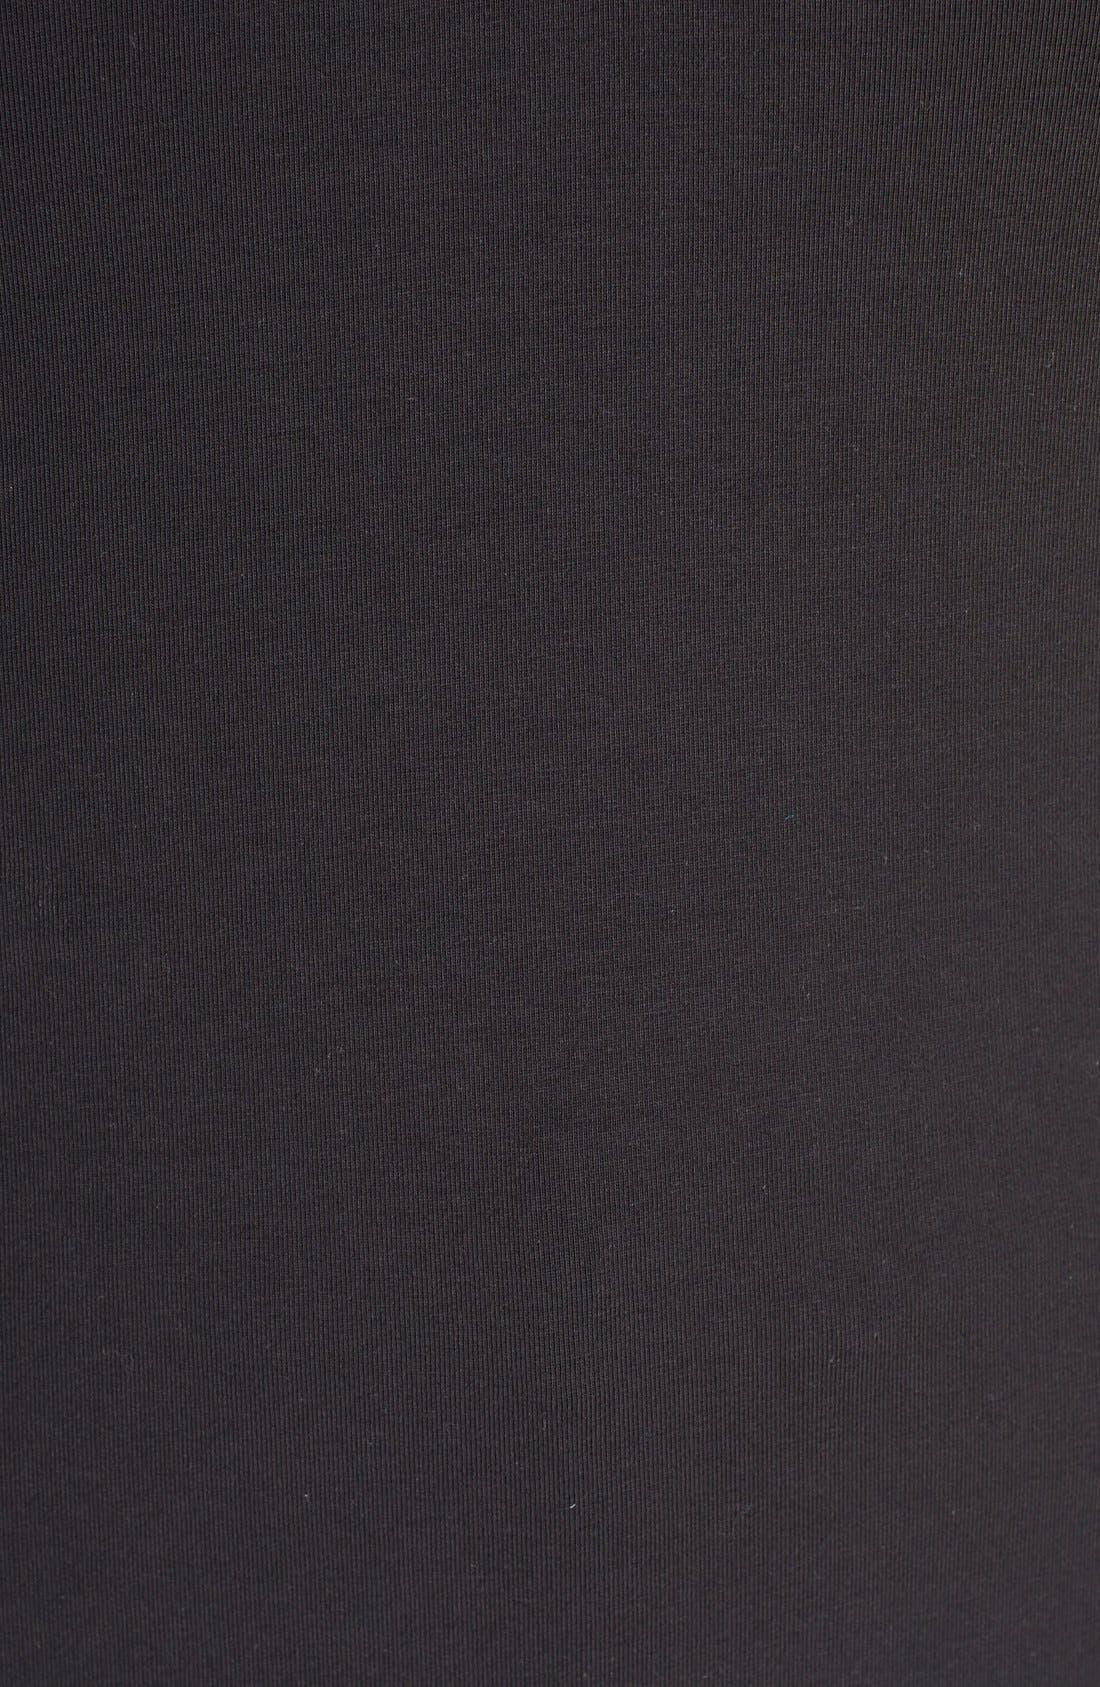 'Sweet Pleat' Sleeveless Top,                             Alternate thumbnail 4, color,                             BLACK ONYX